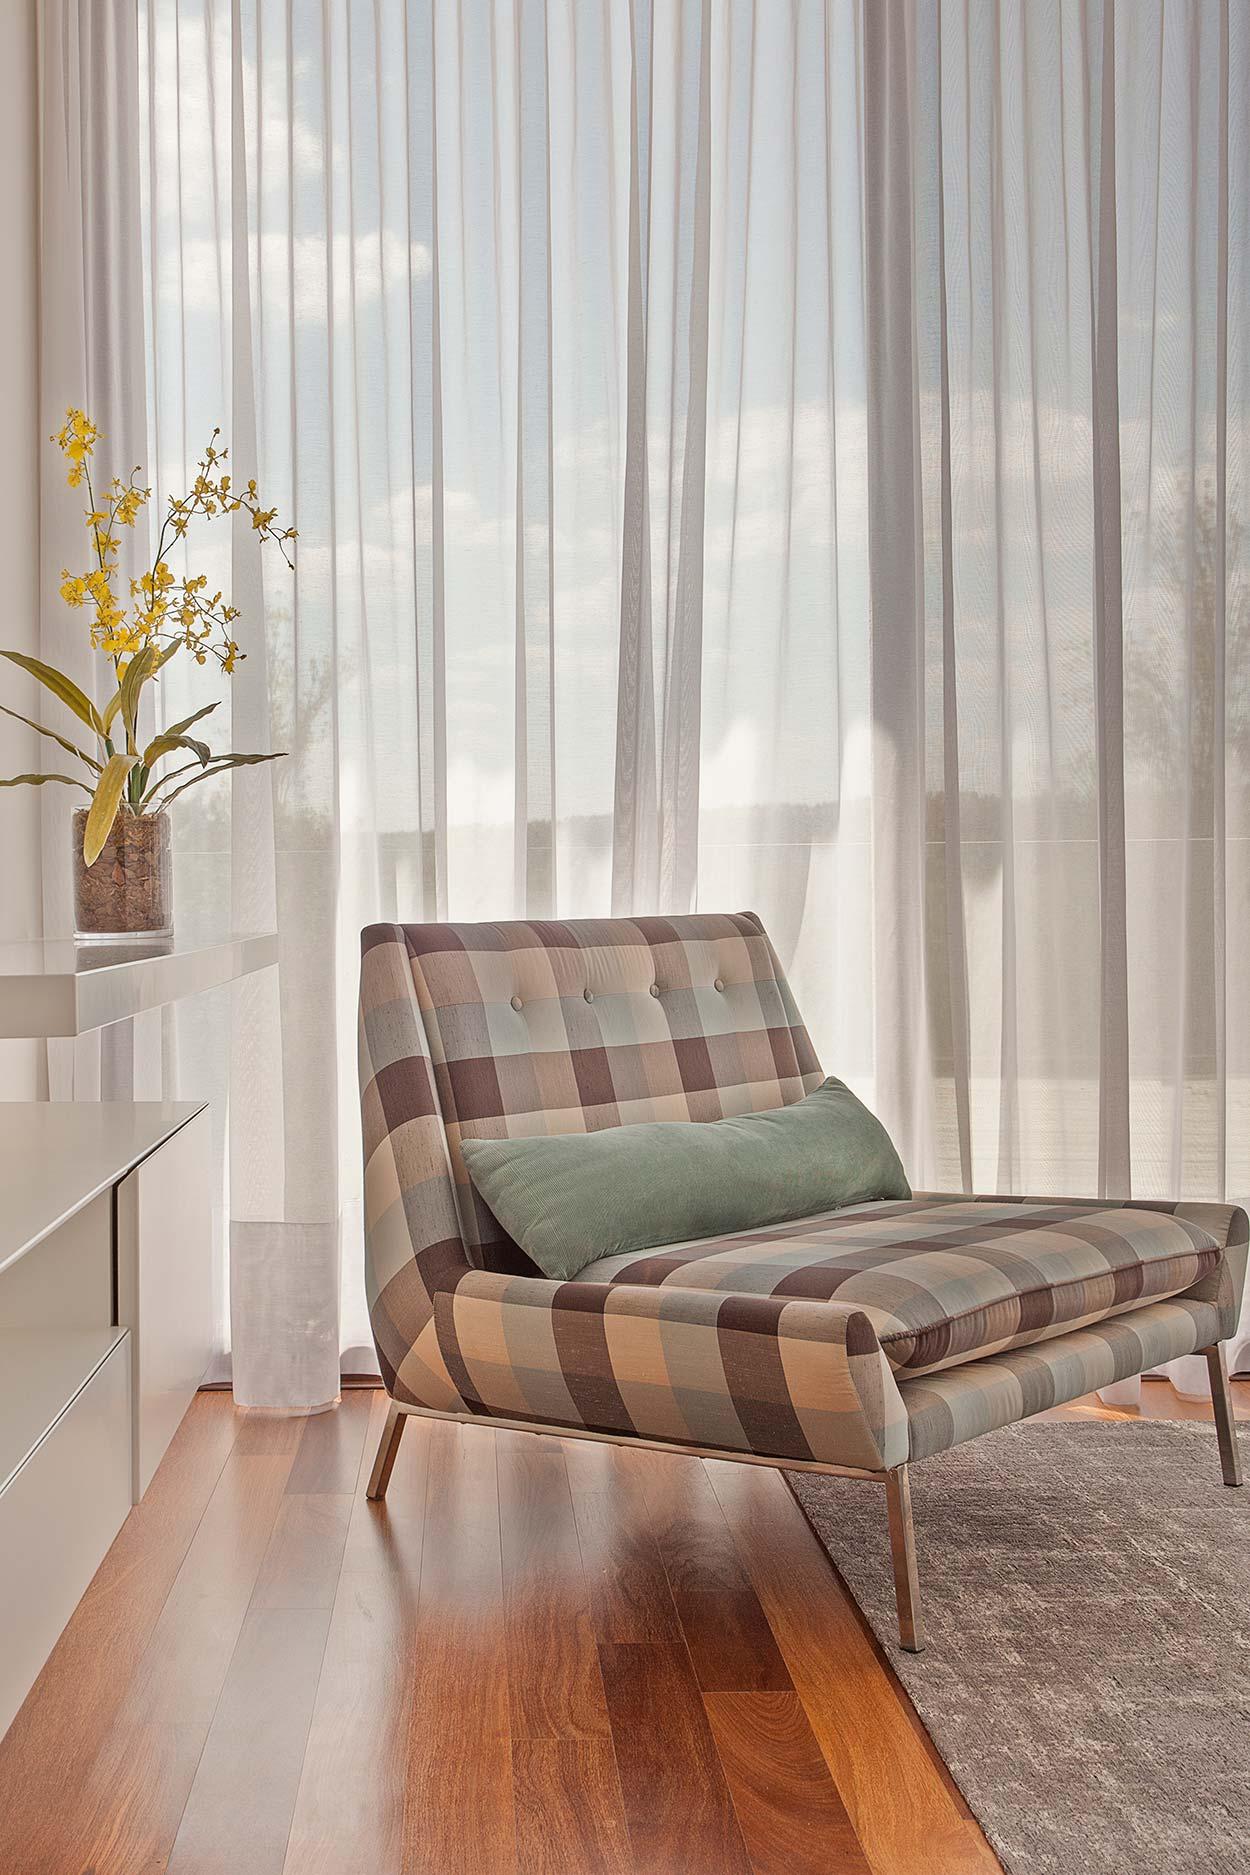 veridianaperes-interiores-Residencia-ER37